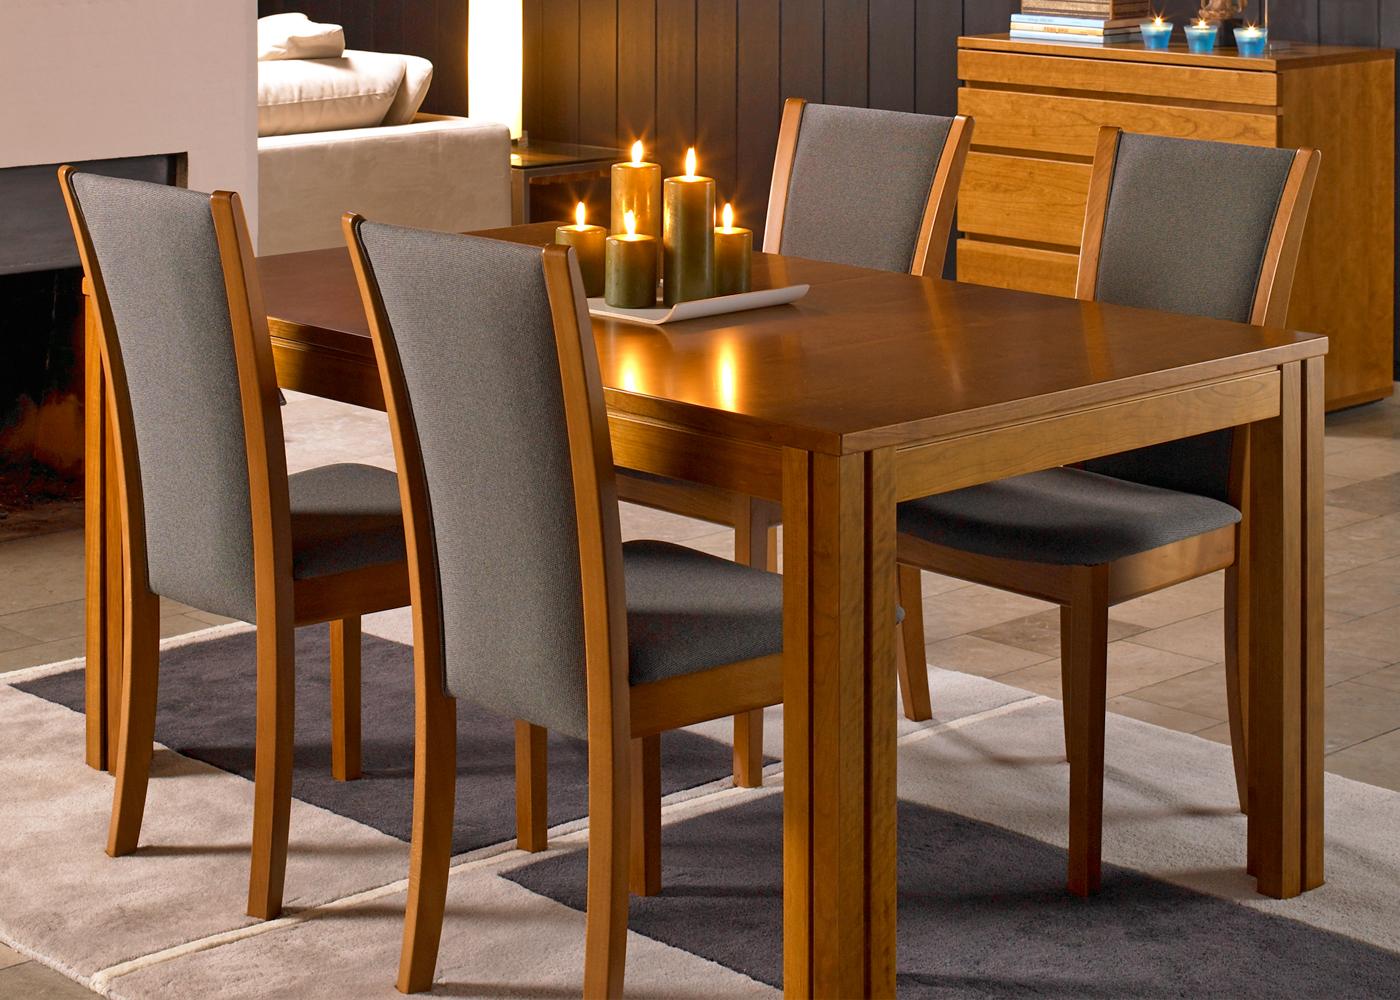 Skovby sm23 Dining Table  Midfurn Furniture Superstore